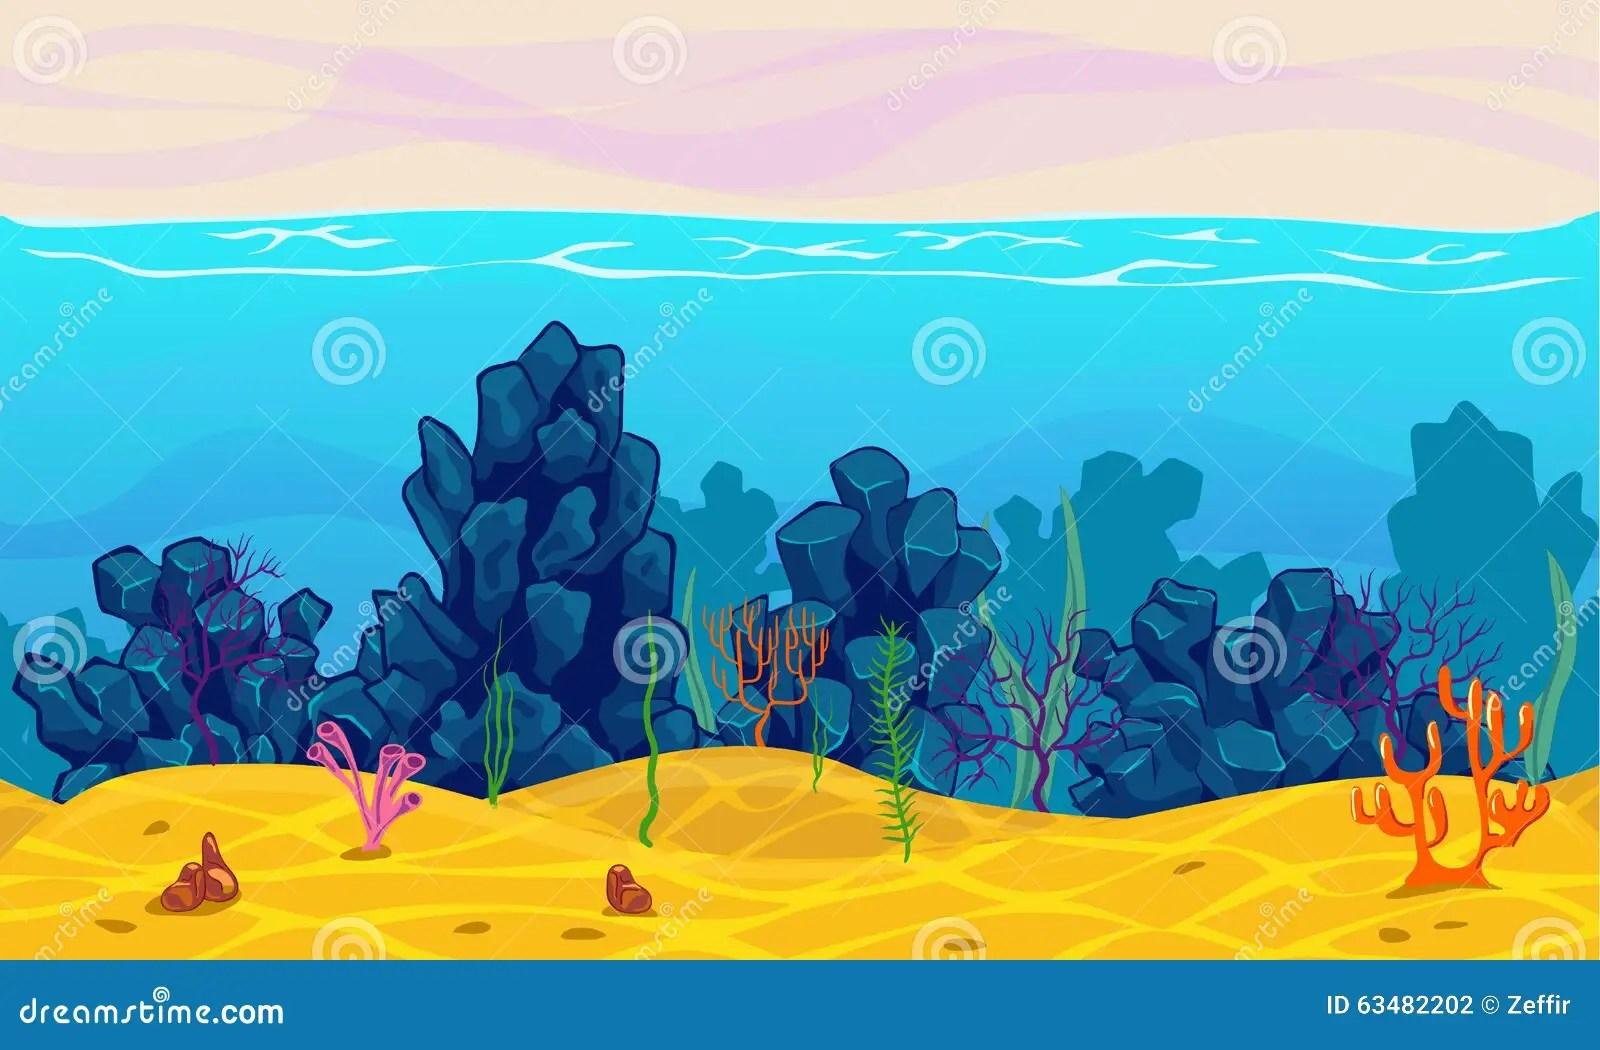 Cute Algae Wallpaper Underwater Seamless Landscape Stock Illustration Image